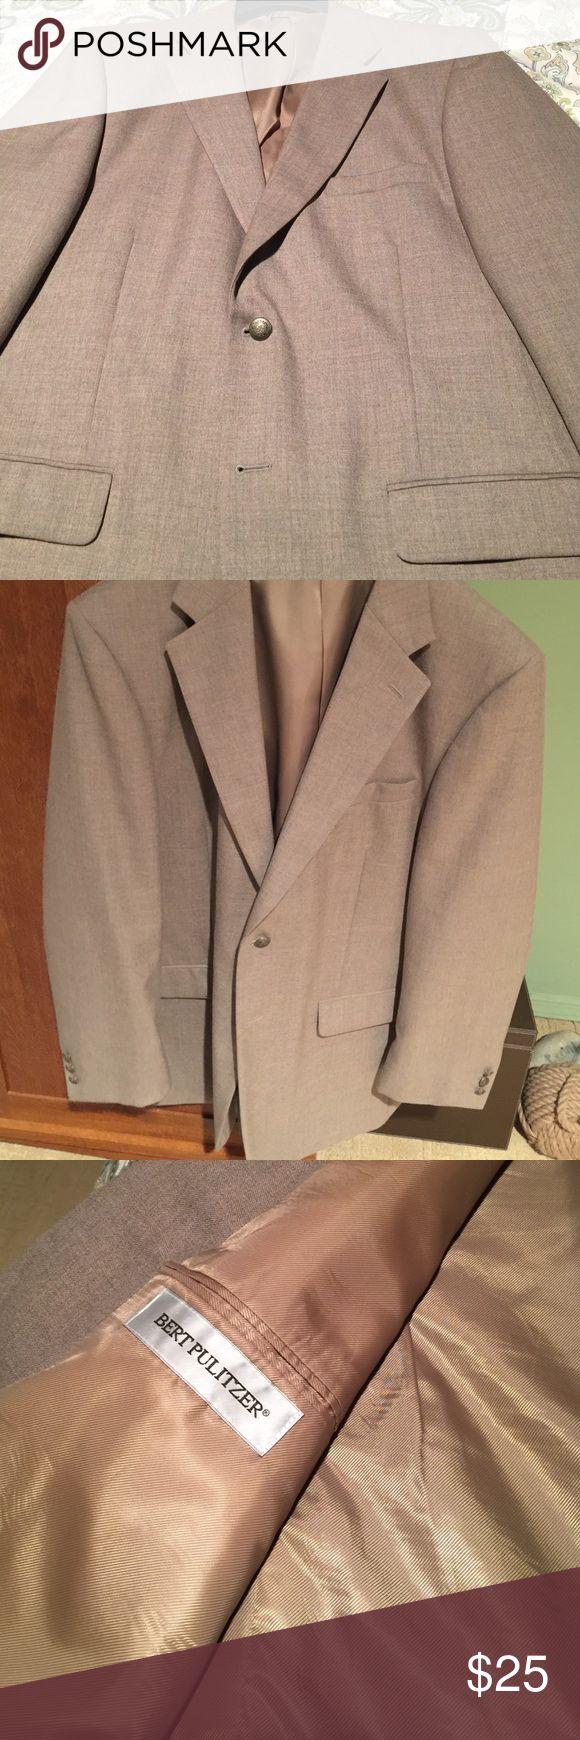 44L Men's Sports Jacket 44L Men's Brown Cotton Blend Sports Jacket • Fully Lined • Brass Buttons Bert Pulitzer Suits & Blazers Sport Coats & Blazers